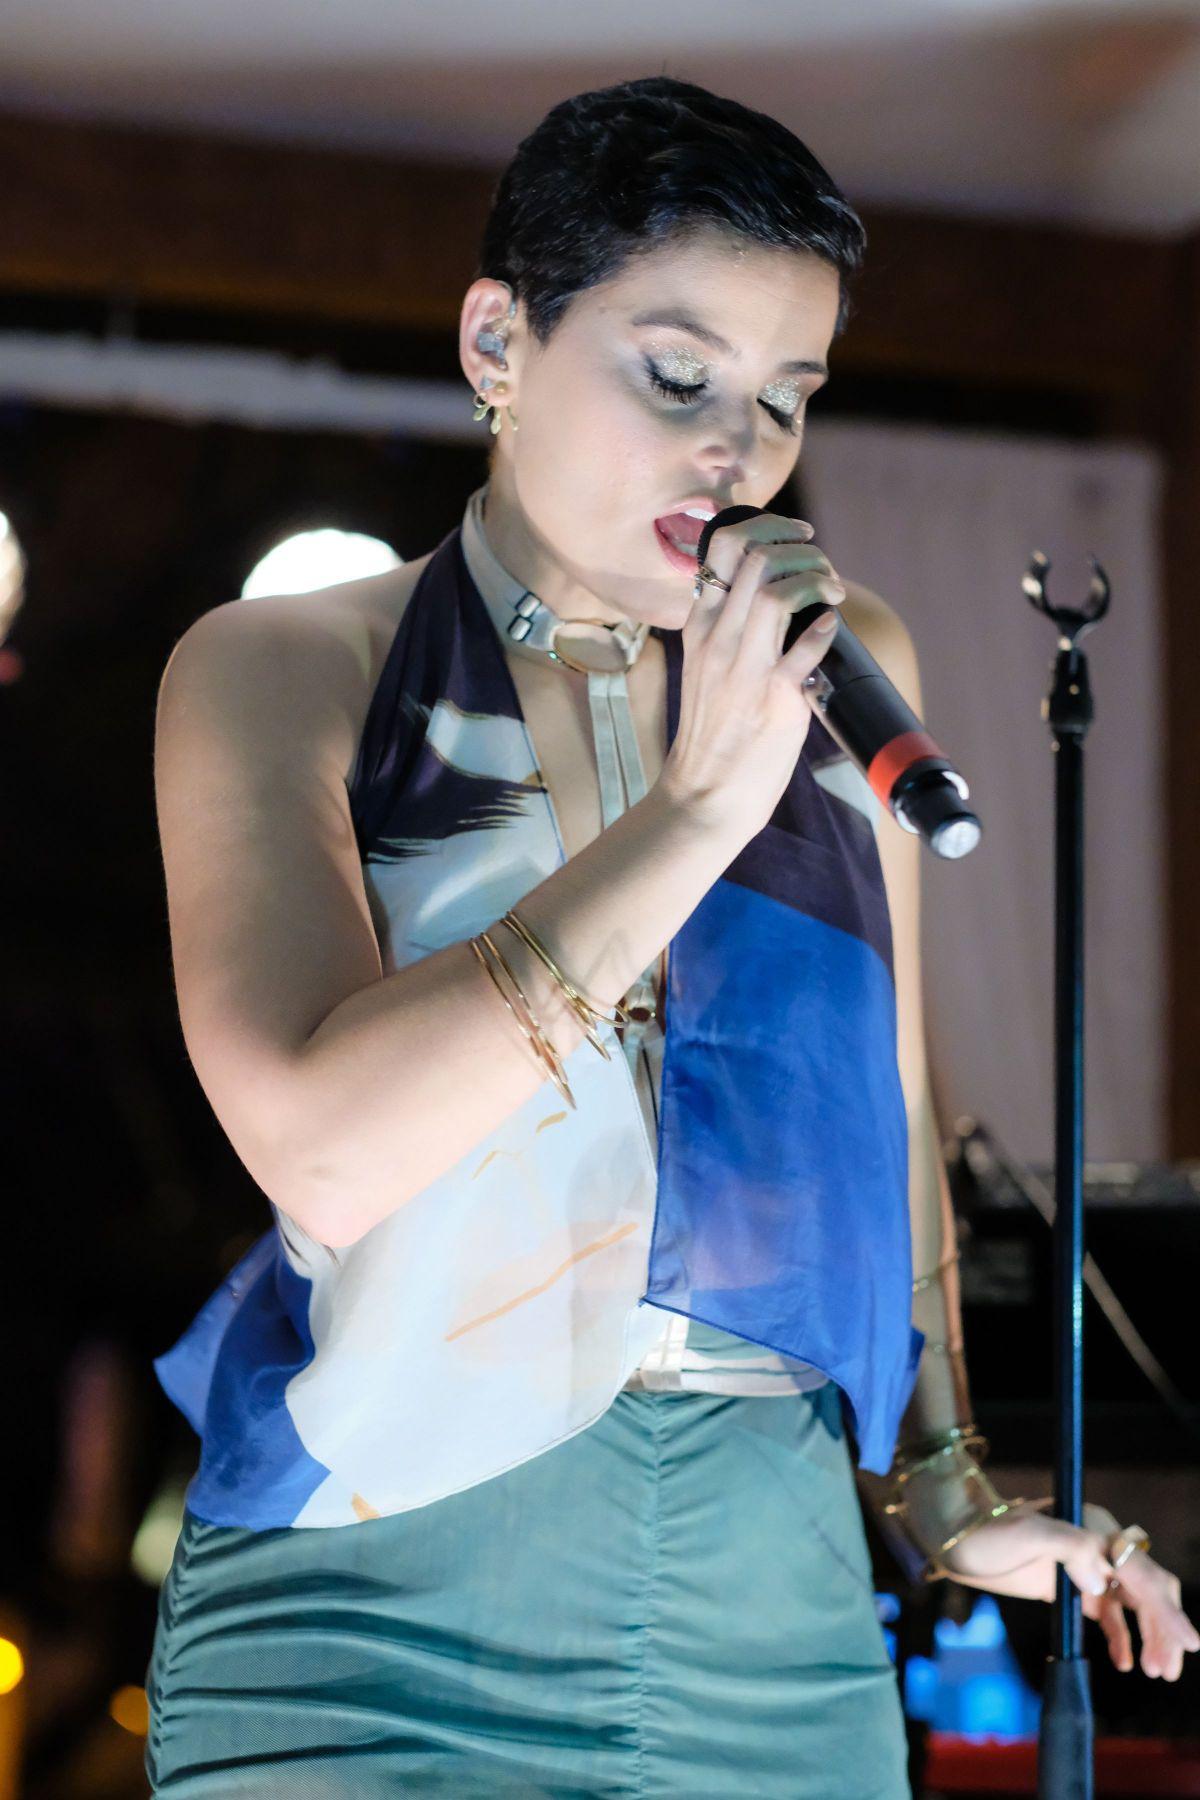 NELLY FURTADO Performs at Alex Katz x HM Art Basel Party in Miami 11/30/2016